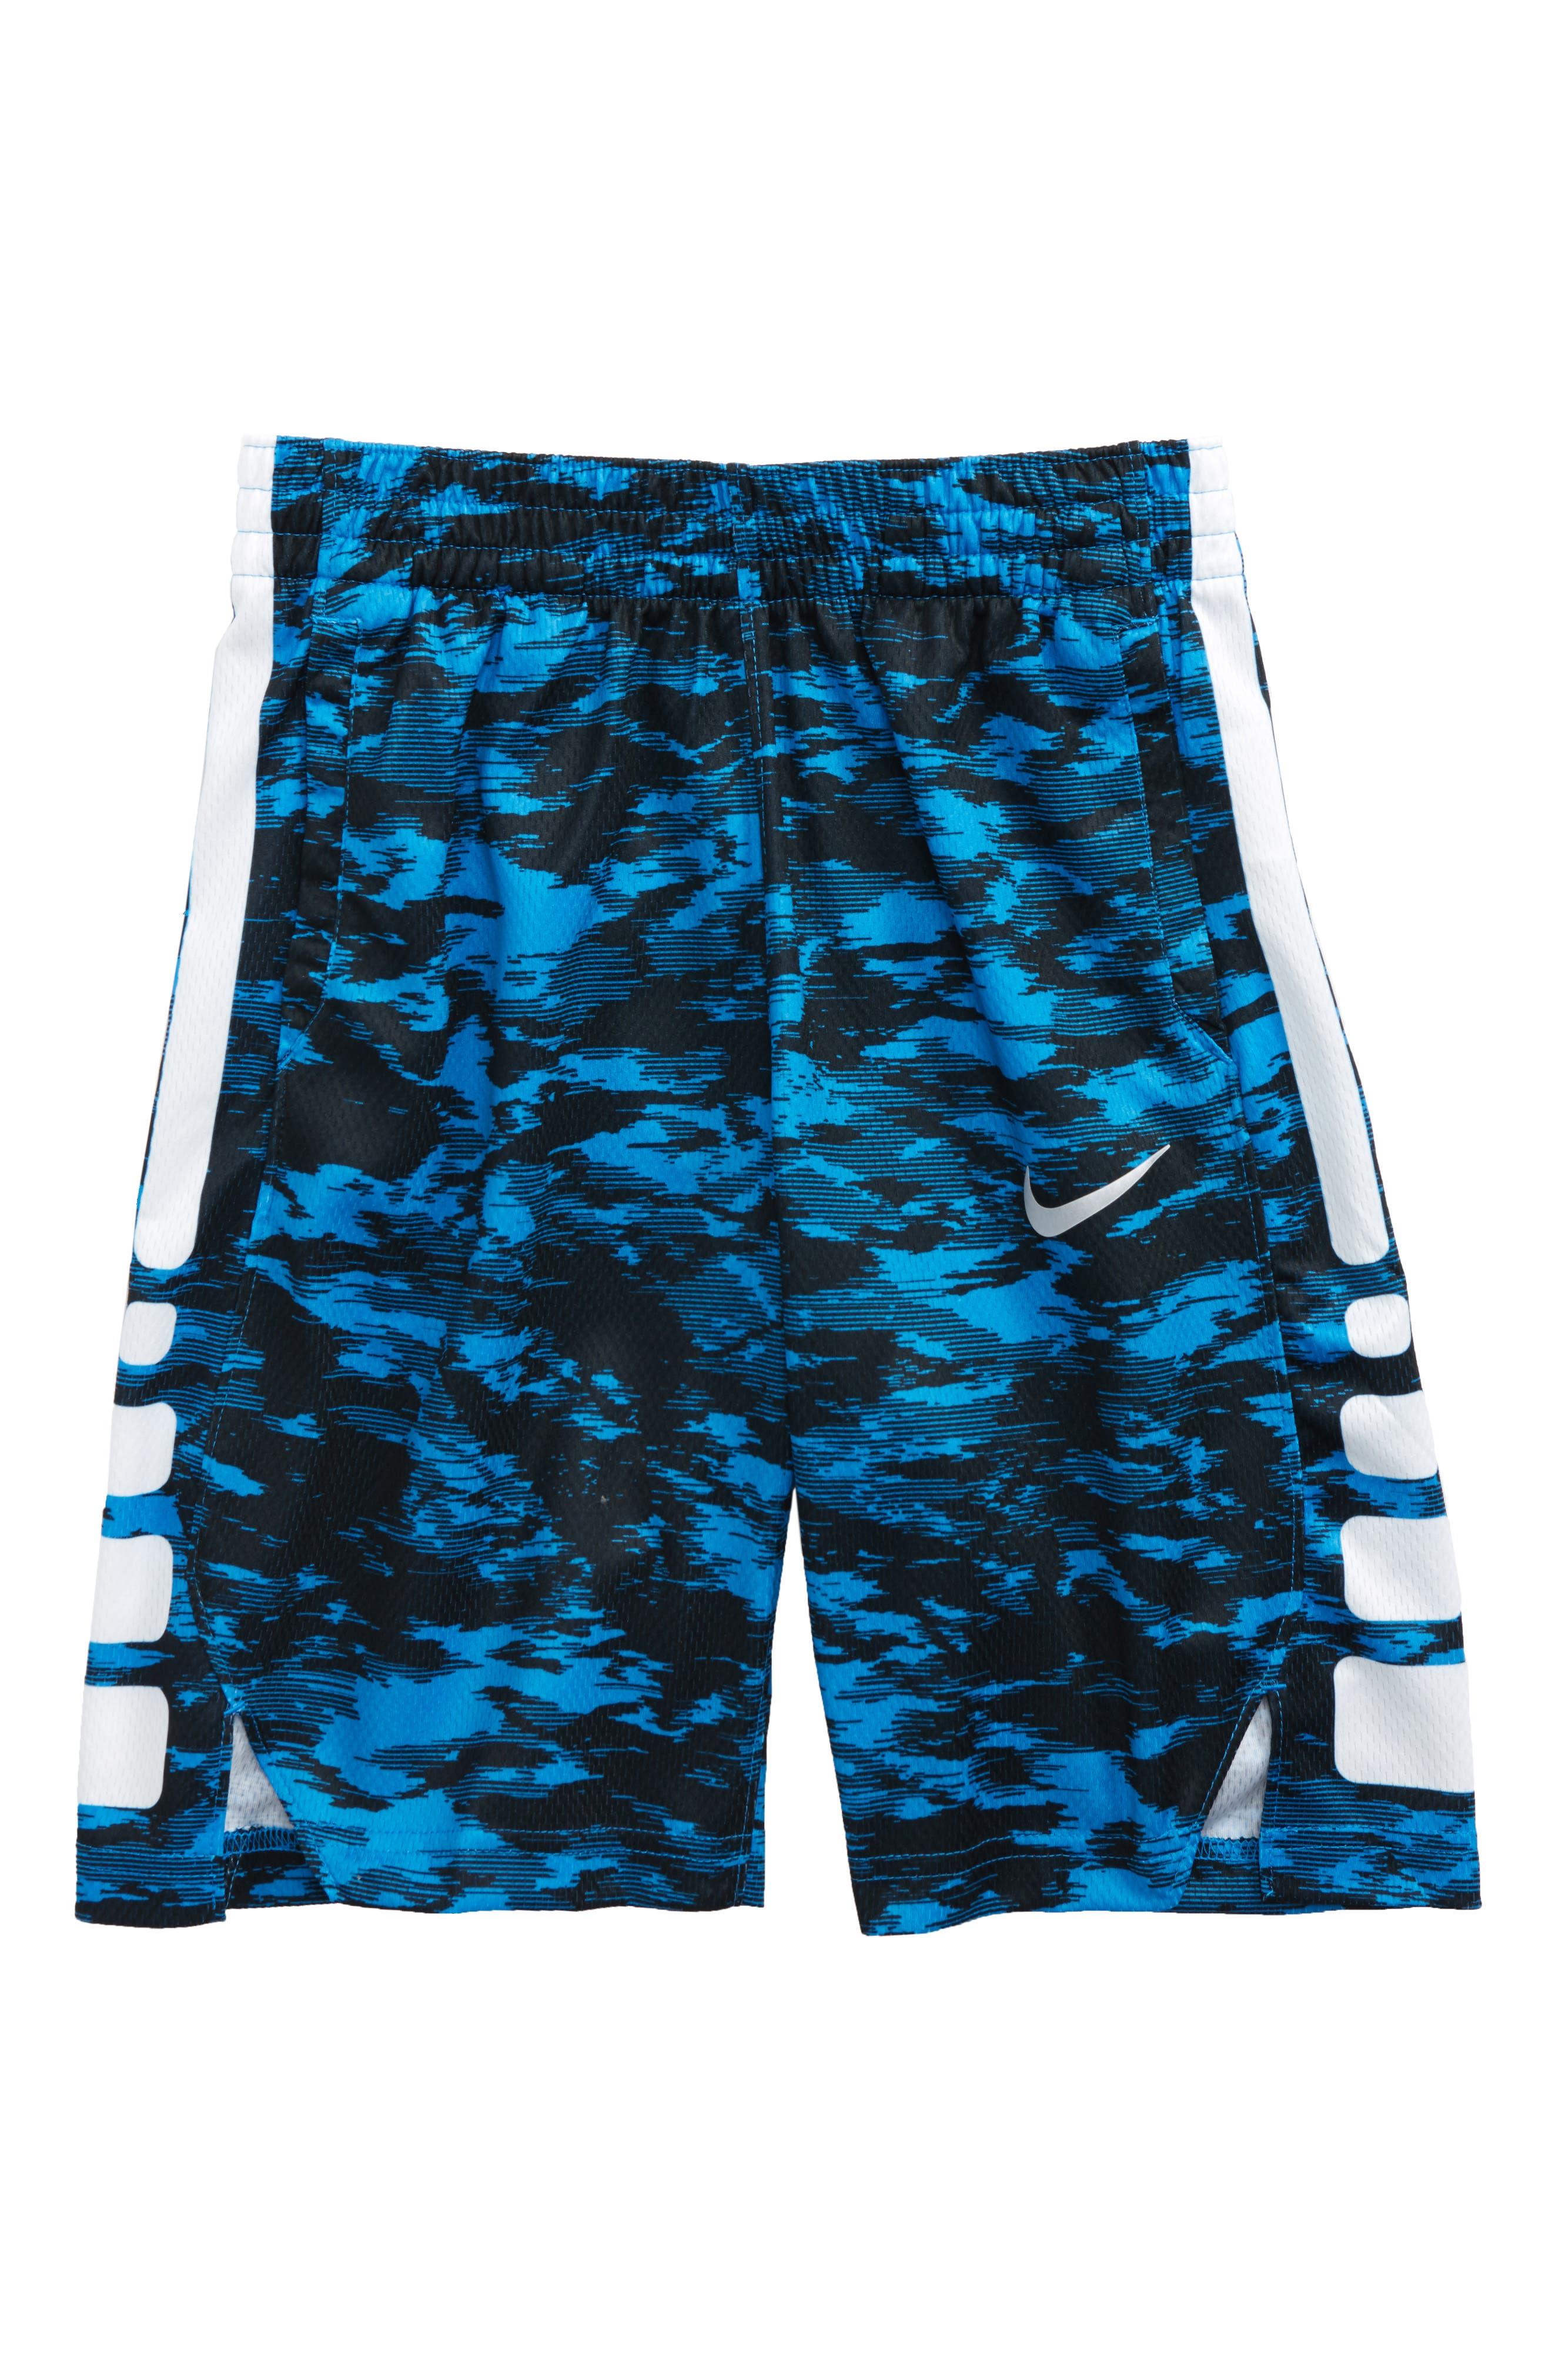 Dry Elite Basketball Shorts,                             Main thumbnail 6, color,